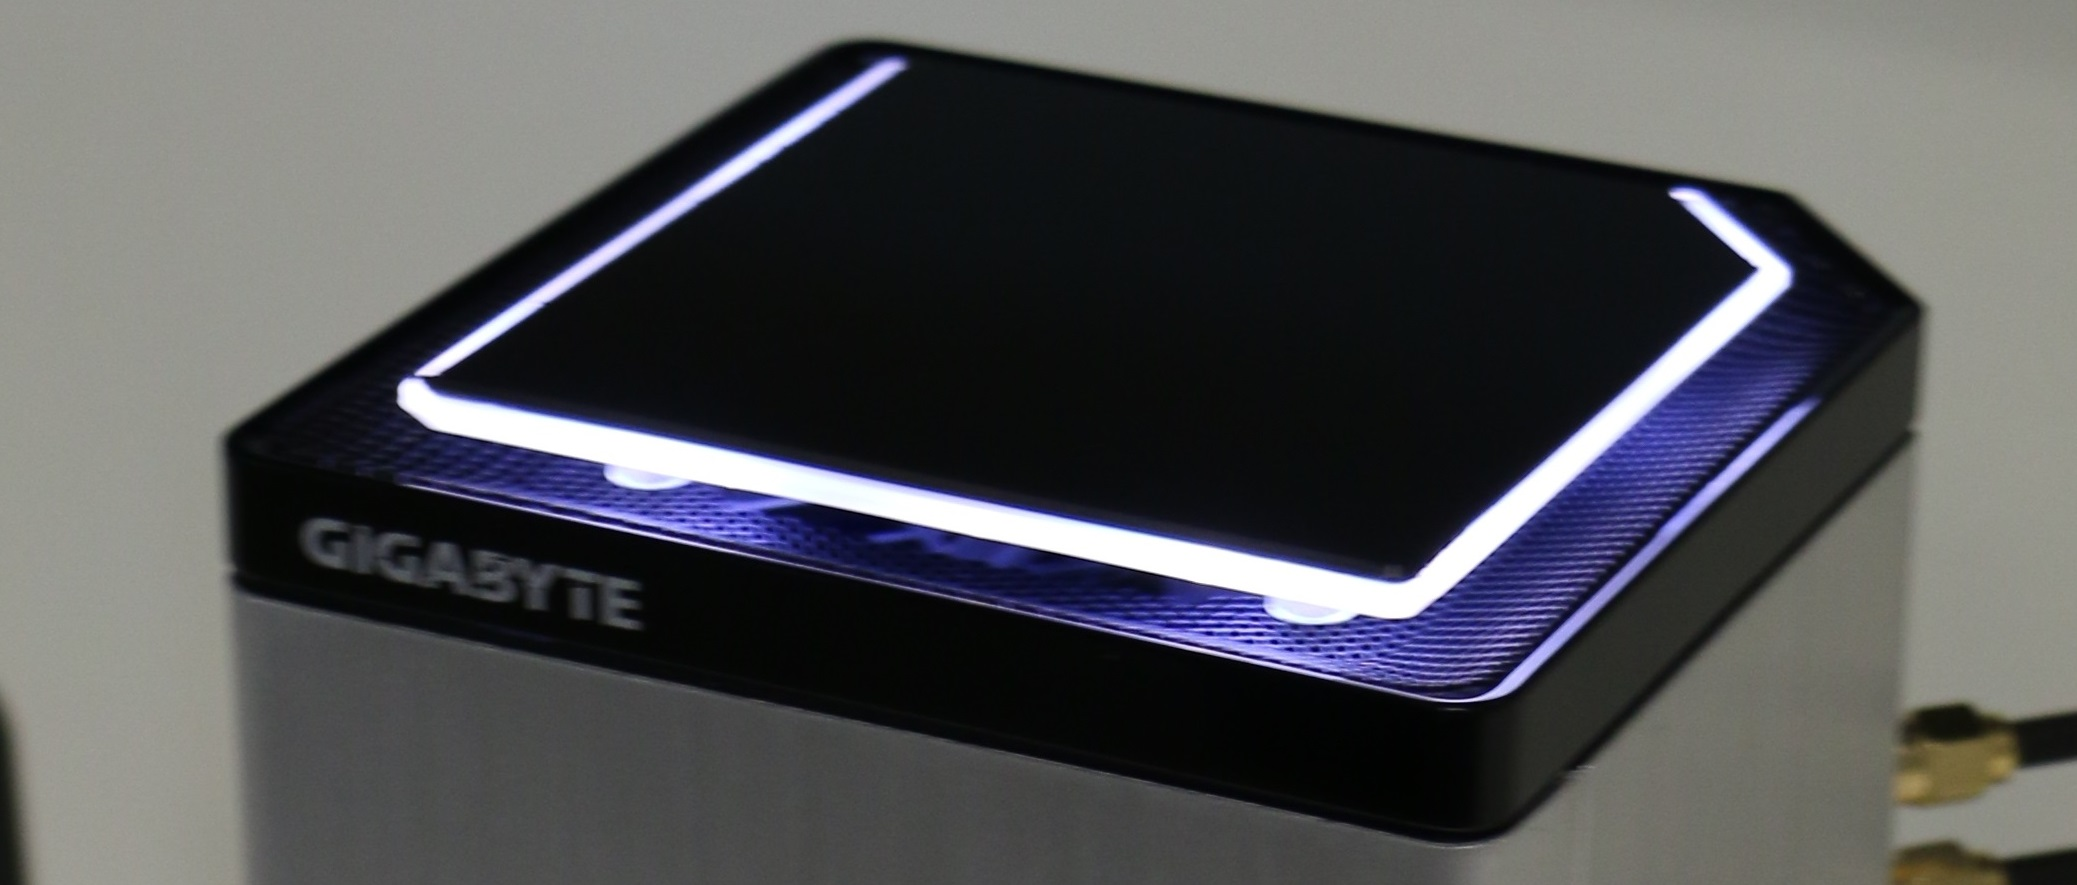 #Computex – Gigabyte Brix GB-BNi7H64-850, el Mini-PC más potente del mercado